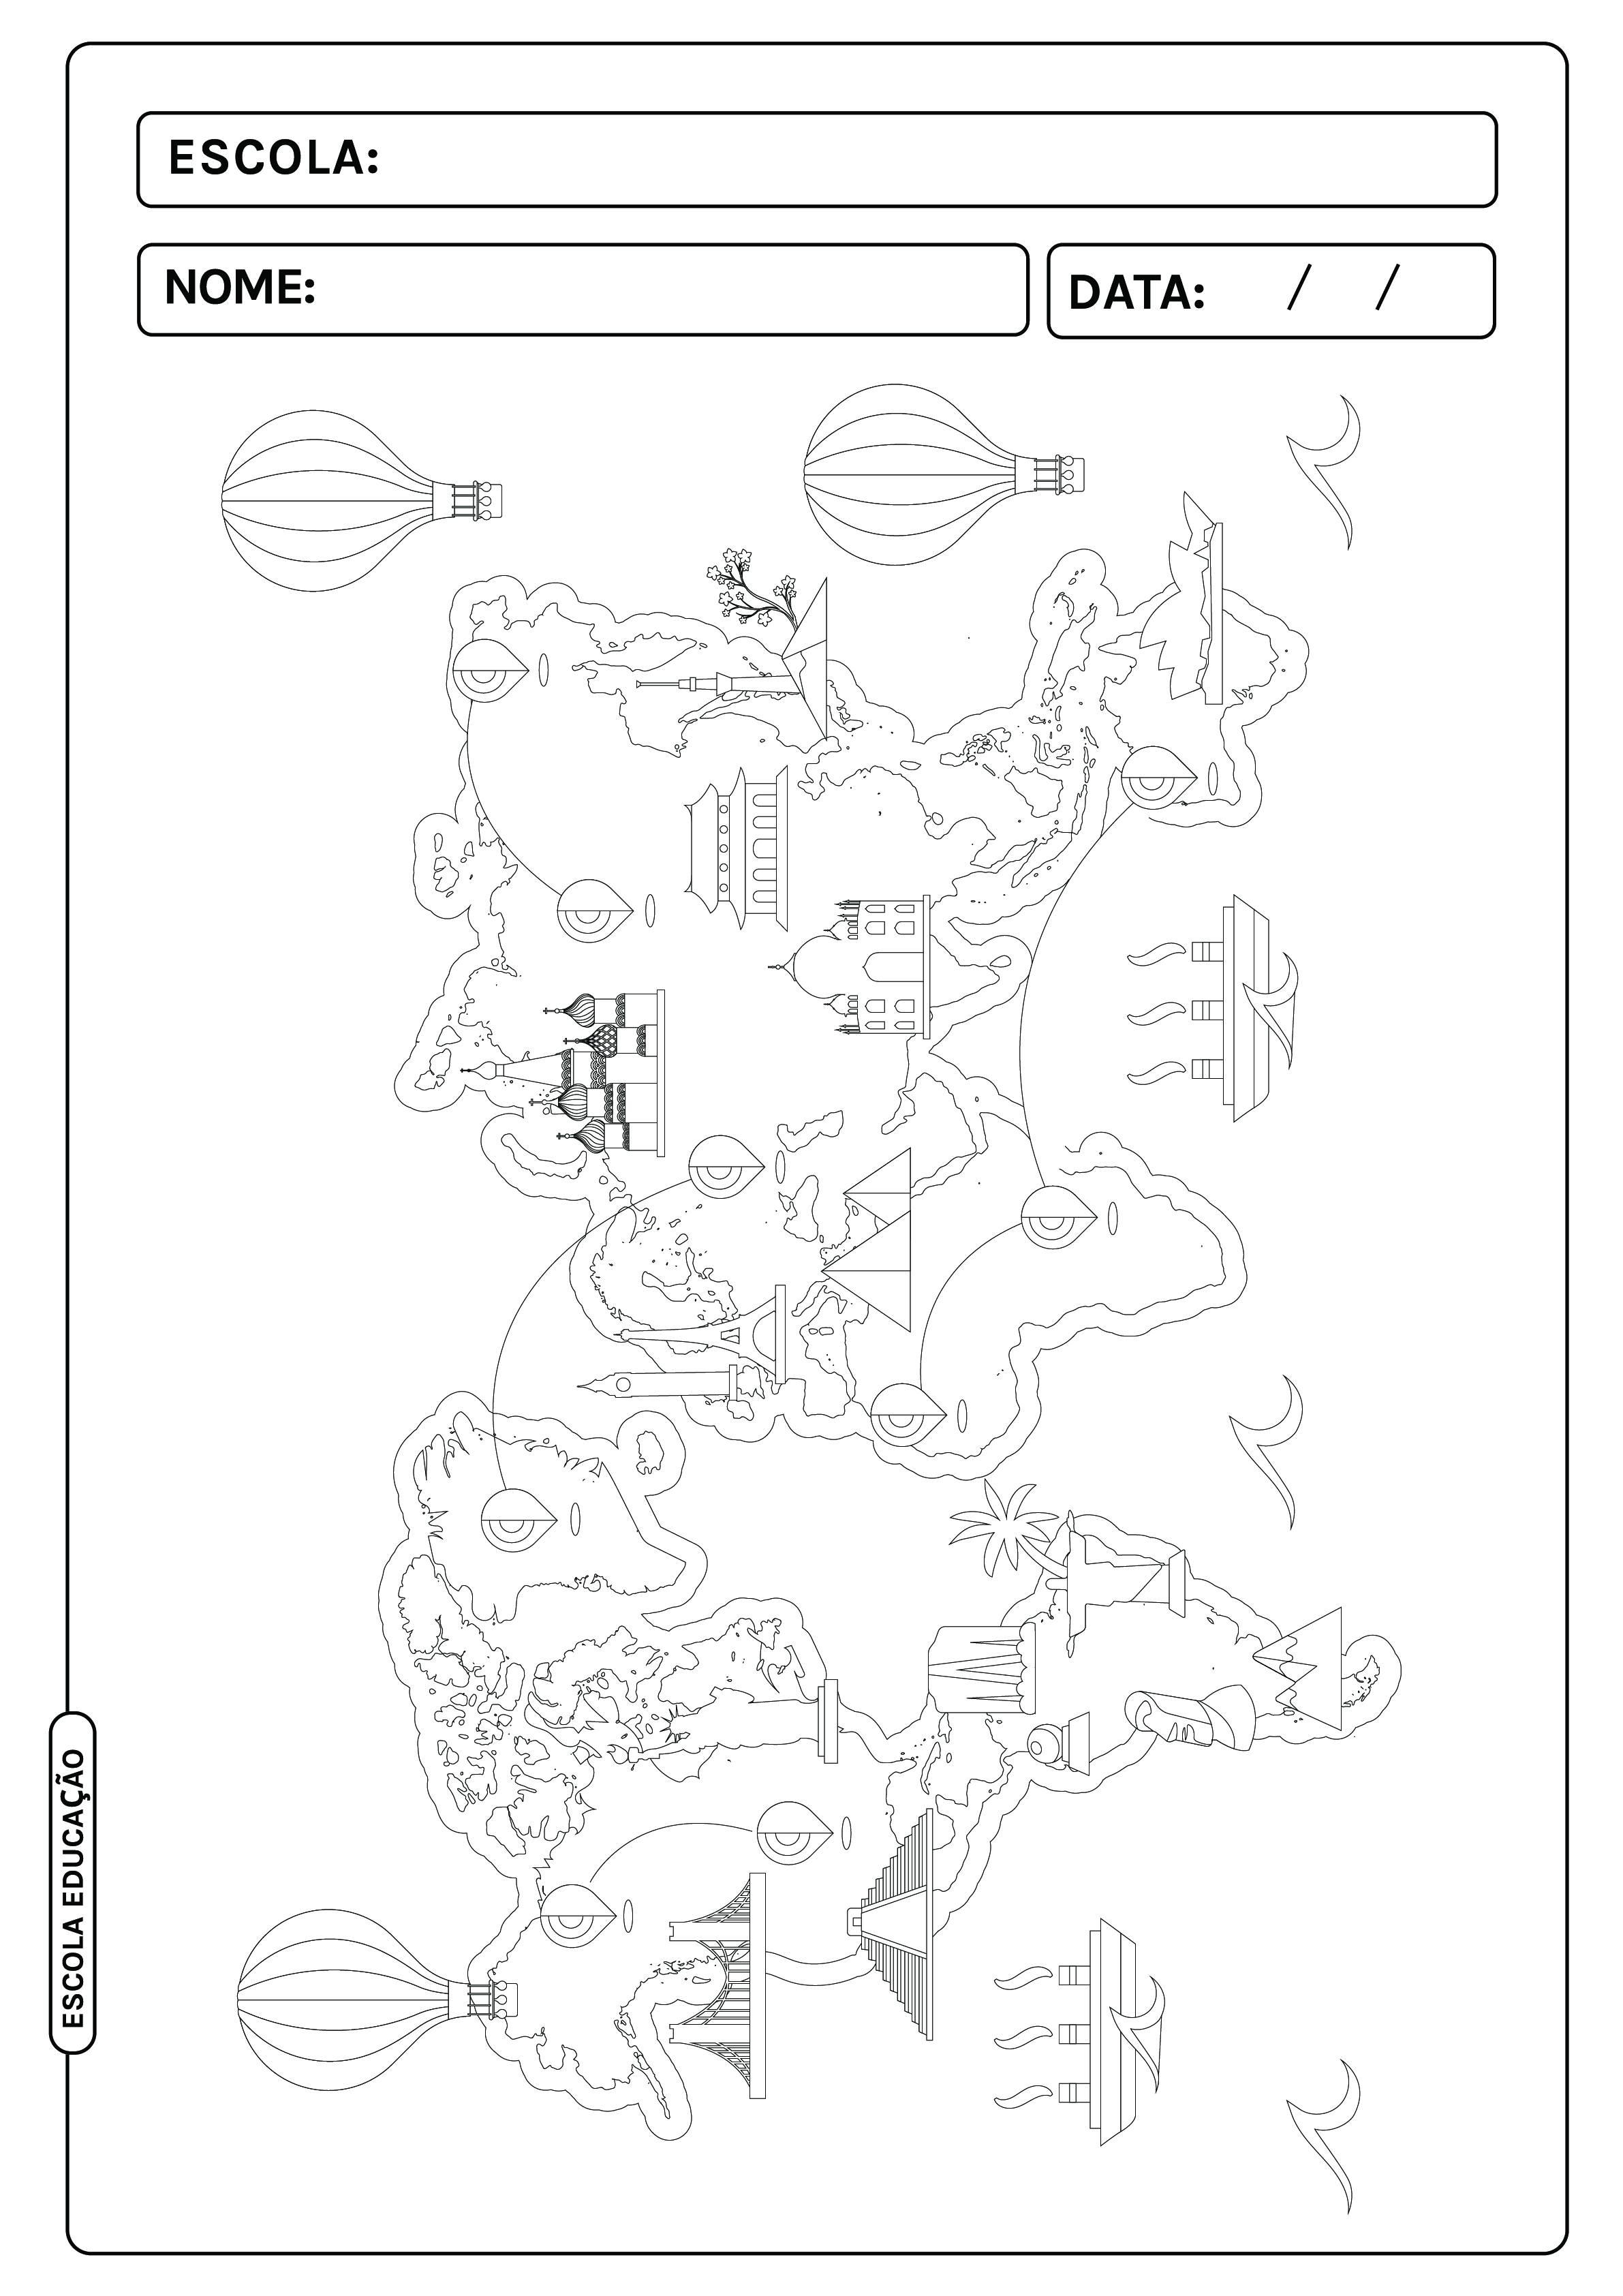 Mapa-múndi para colorir